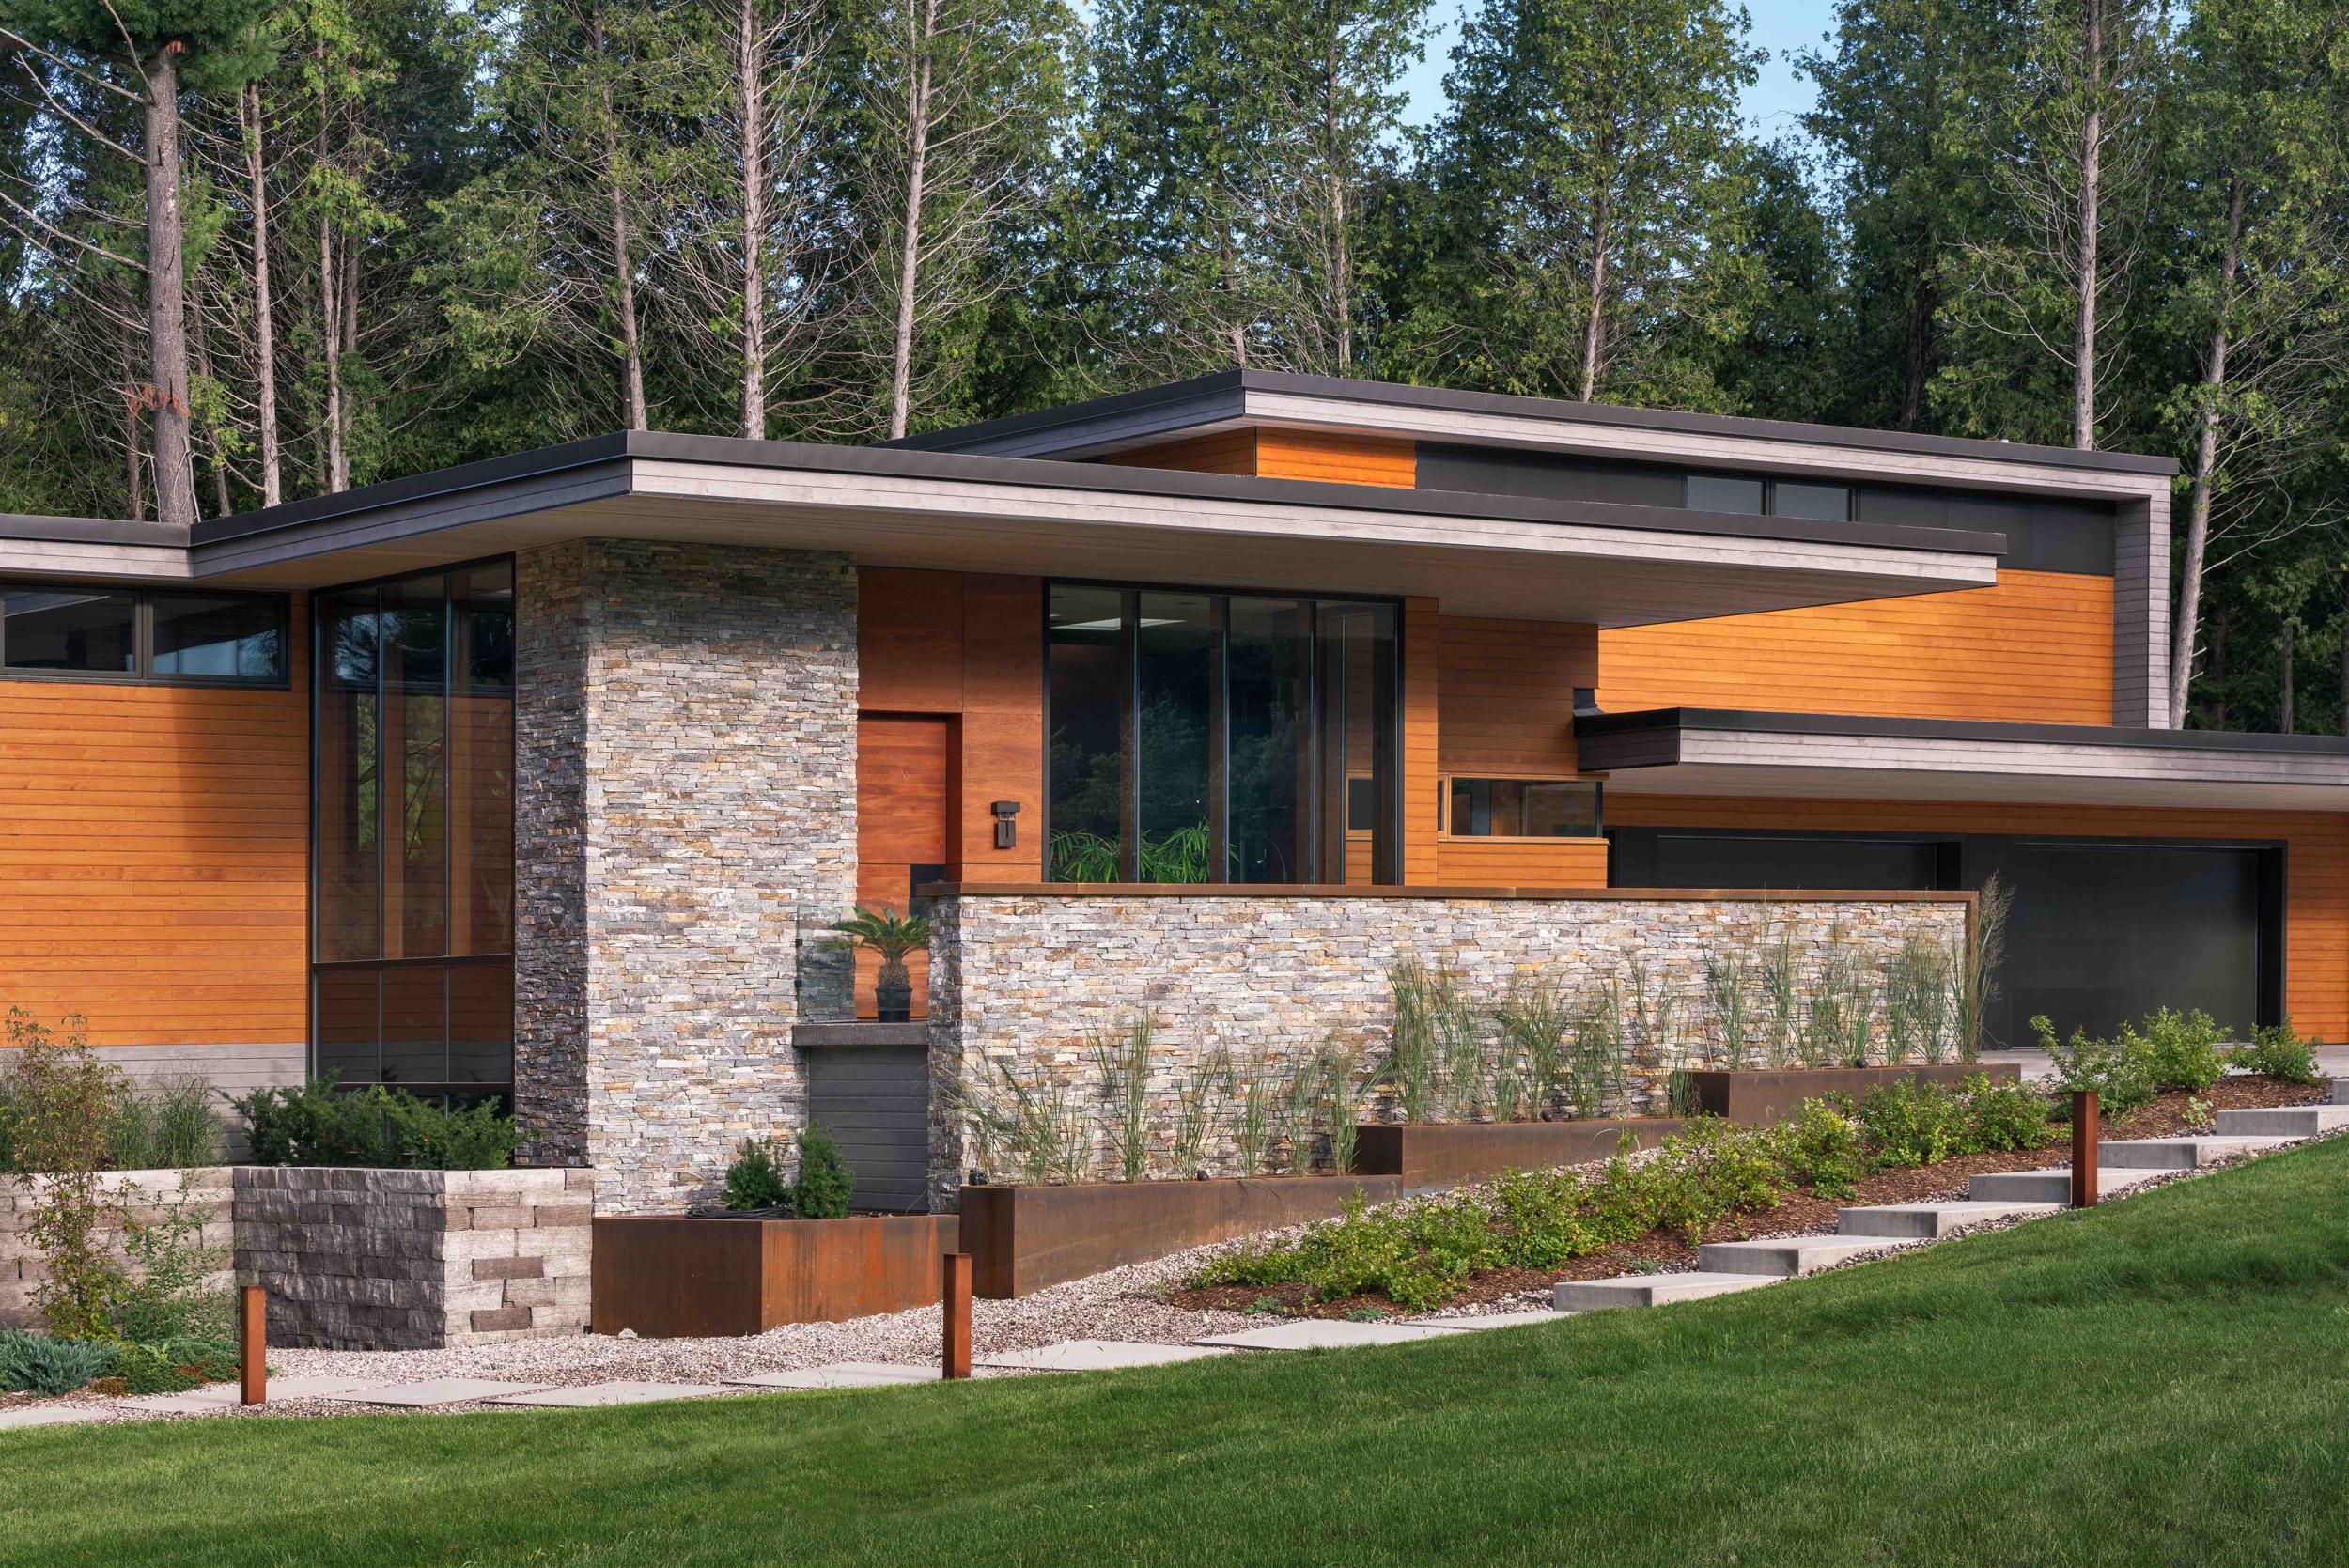 Modern house design by trevor mcivor architect toronto